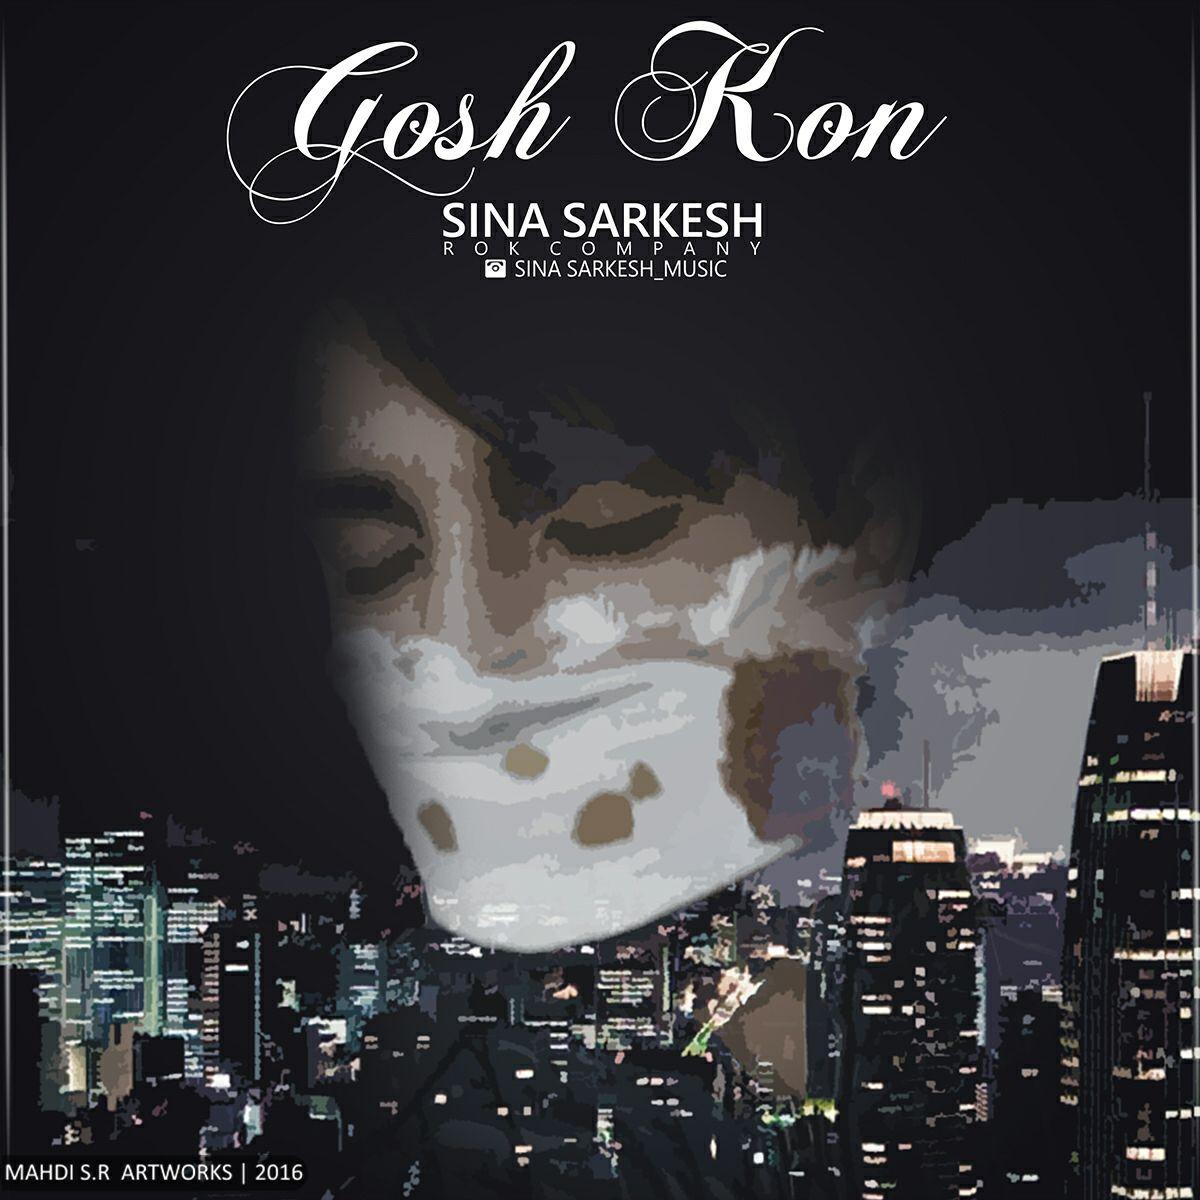 Siina Sarkesh – Gosh Kon